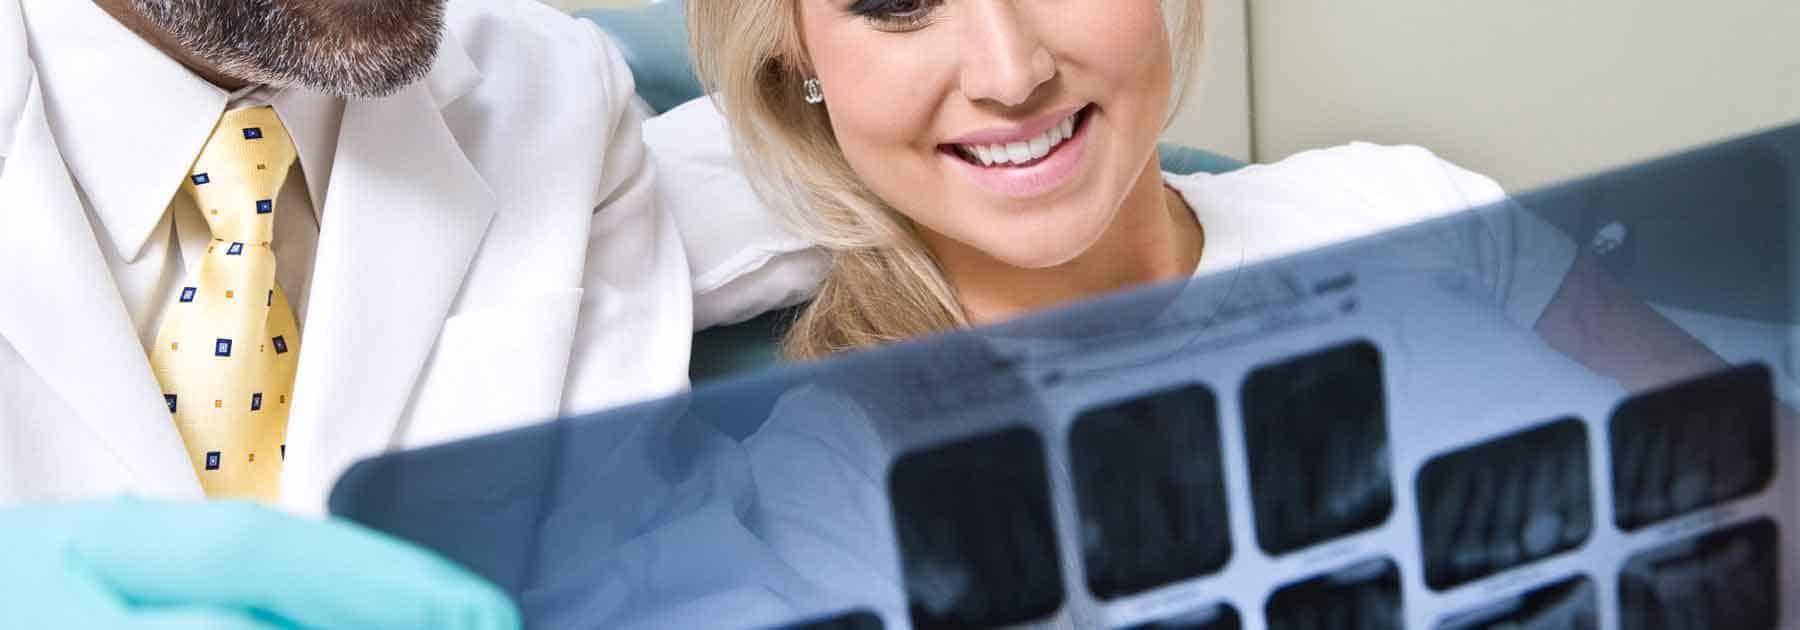 Blue Country Insurance, Agent for Medavie Blue Cross - Stand Alone Dental Insurance